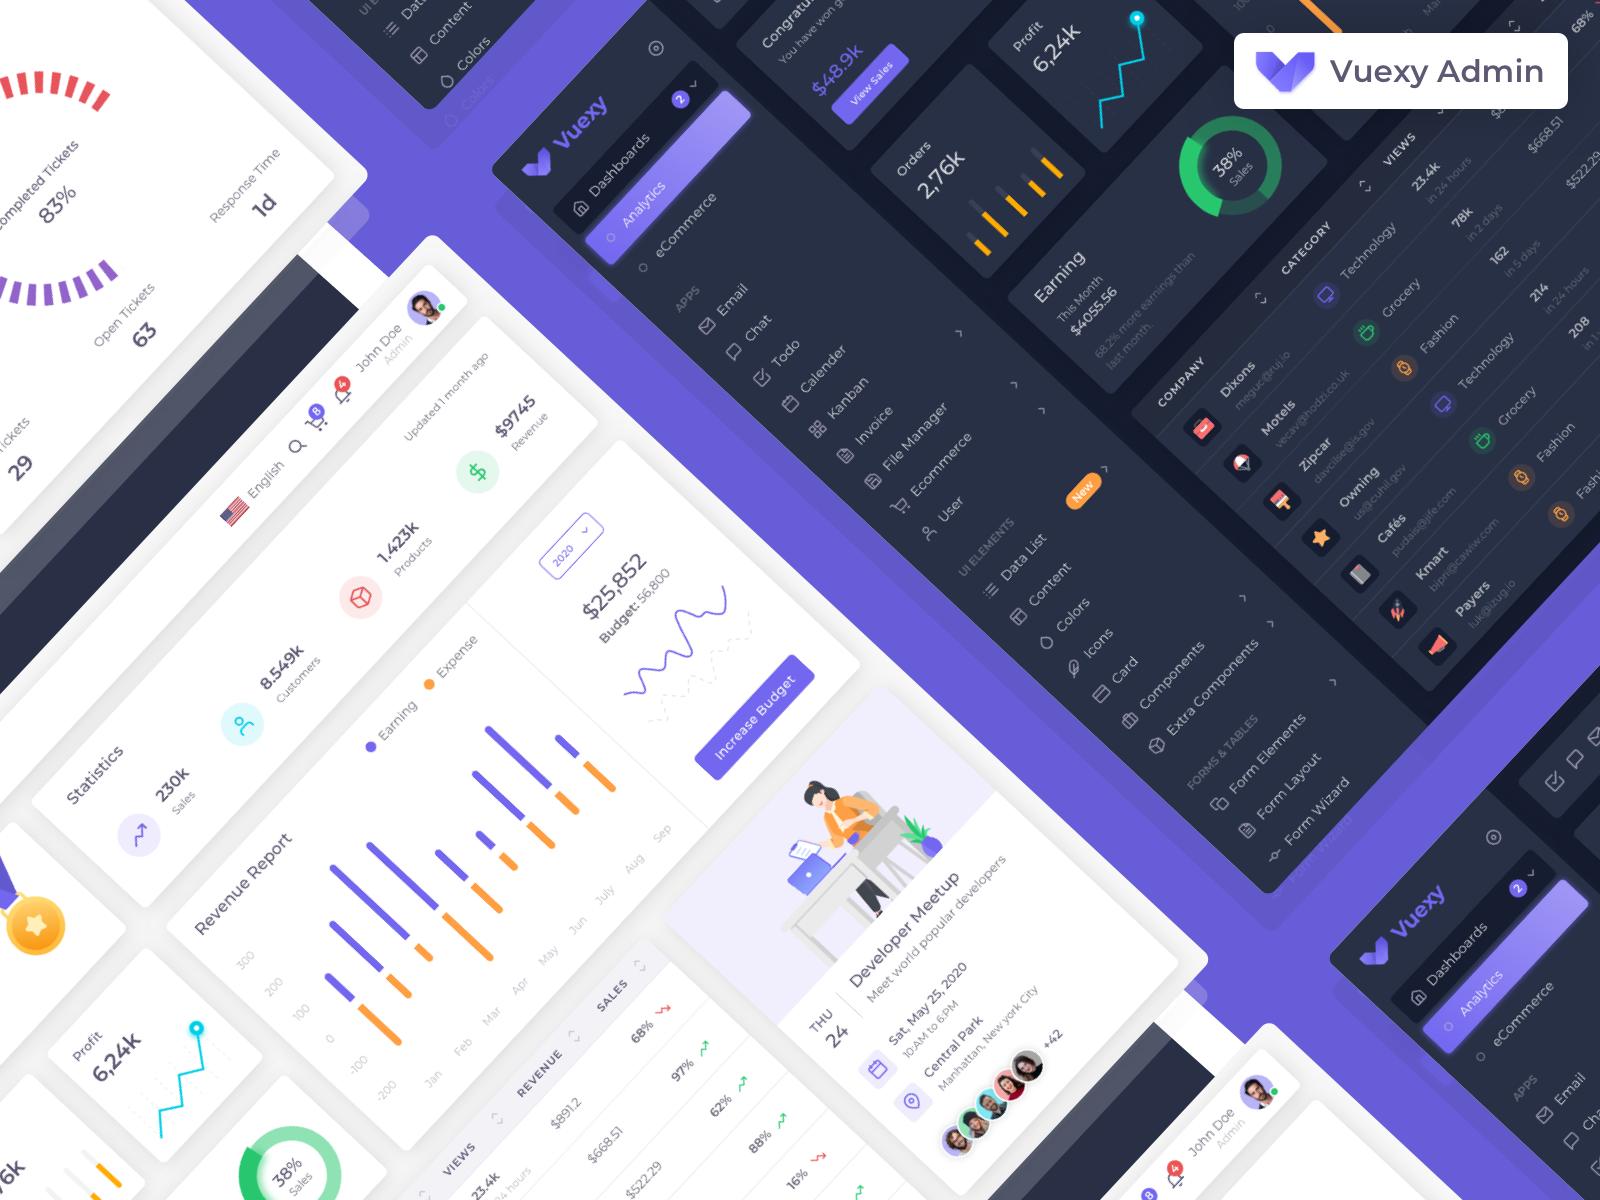 Vuexy free tools for web designers